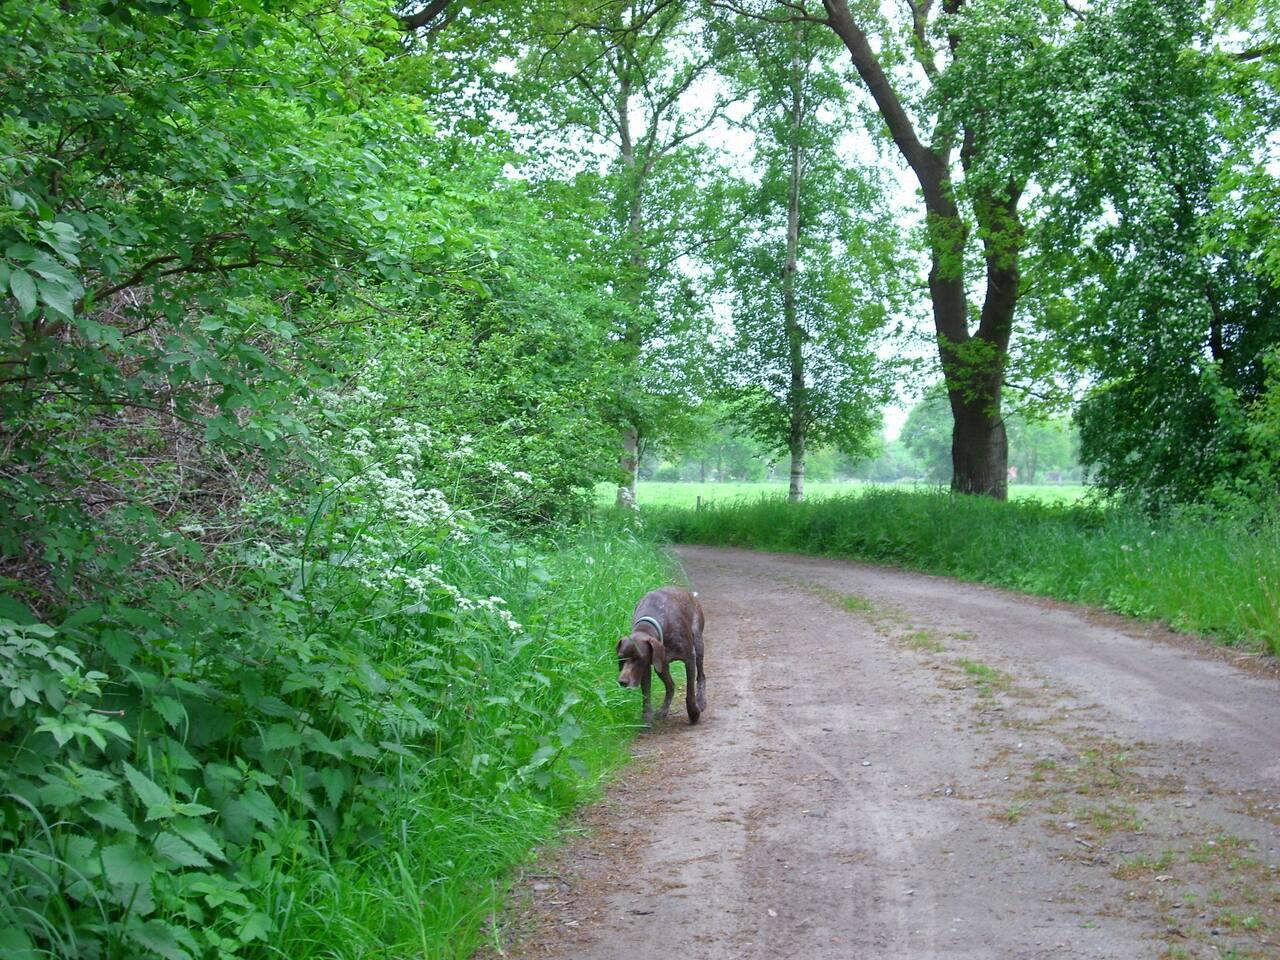 Urlaub in Friesland Fewo Elsa in Nordseenähe